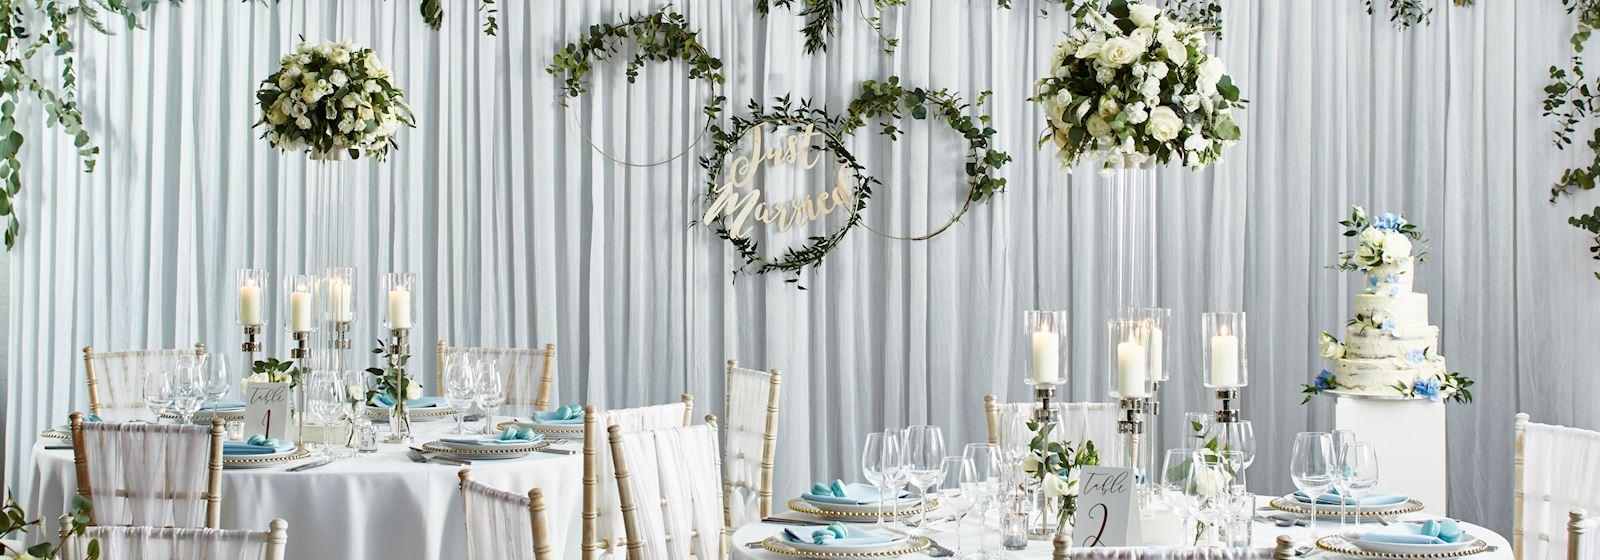 St Pierre Marriott Hotel & Country Club Weddings